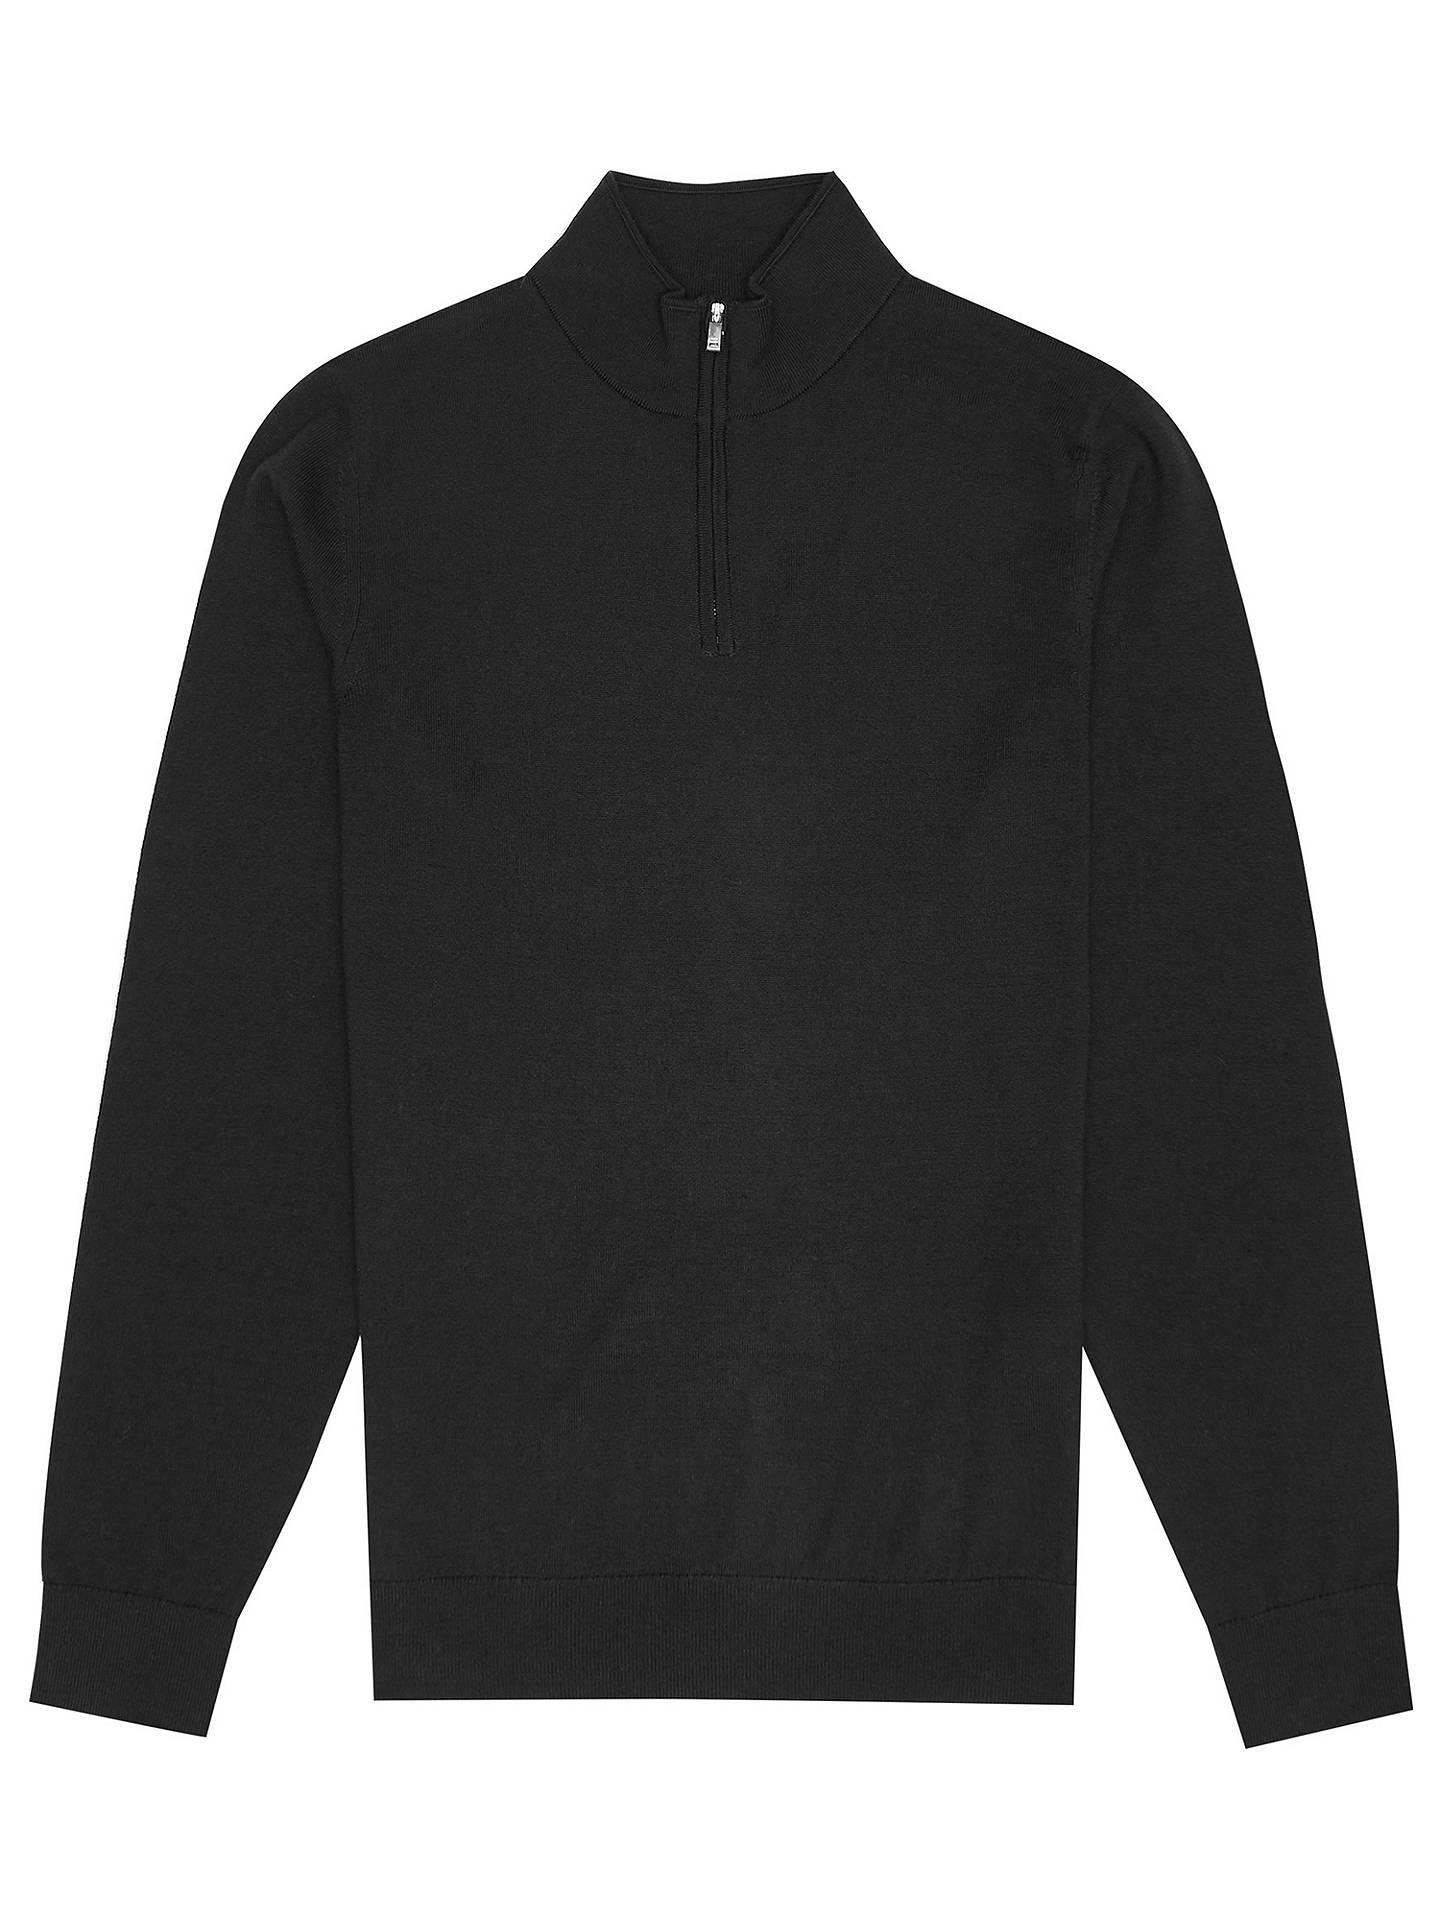 75e9c371491 Reiss Merino Wool Zip Neck Jumper at John Lewis & Partners